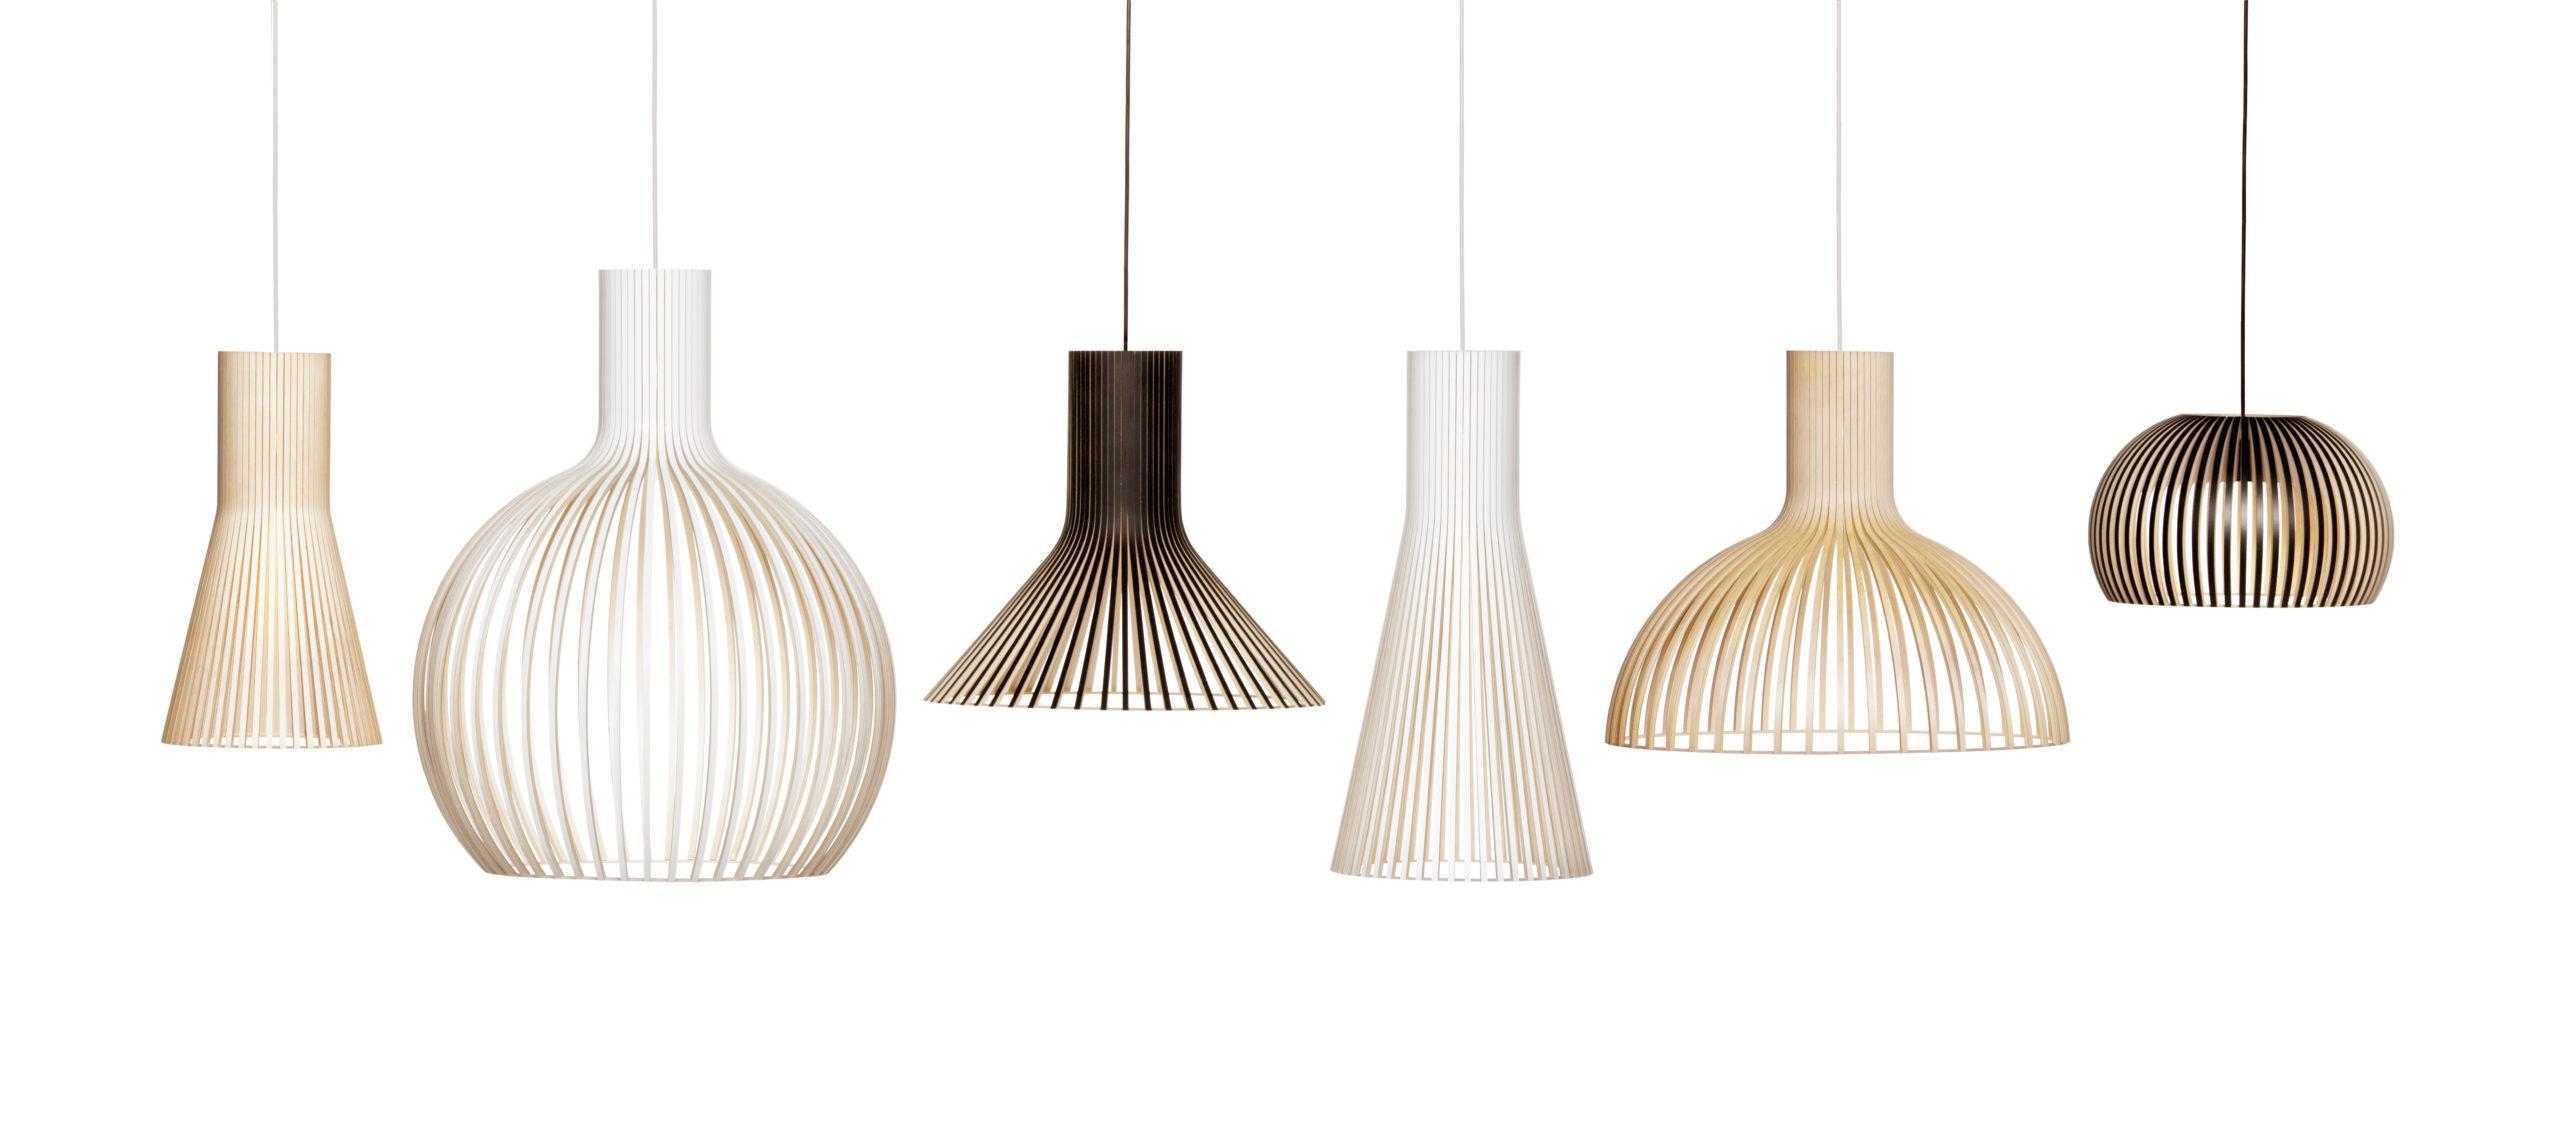 Secto Design lamp made of Koskisen thin plywood